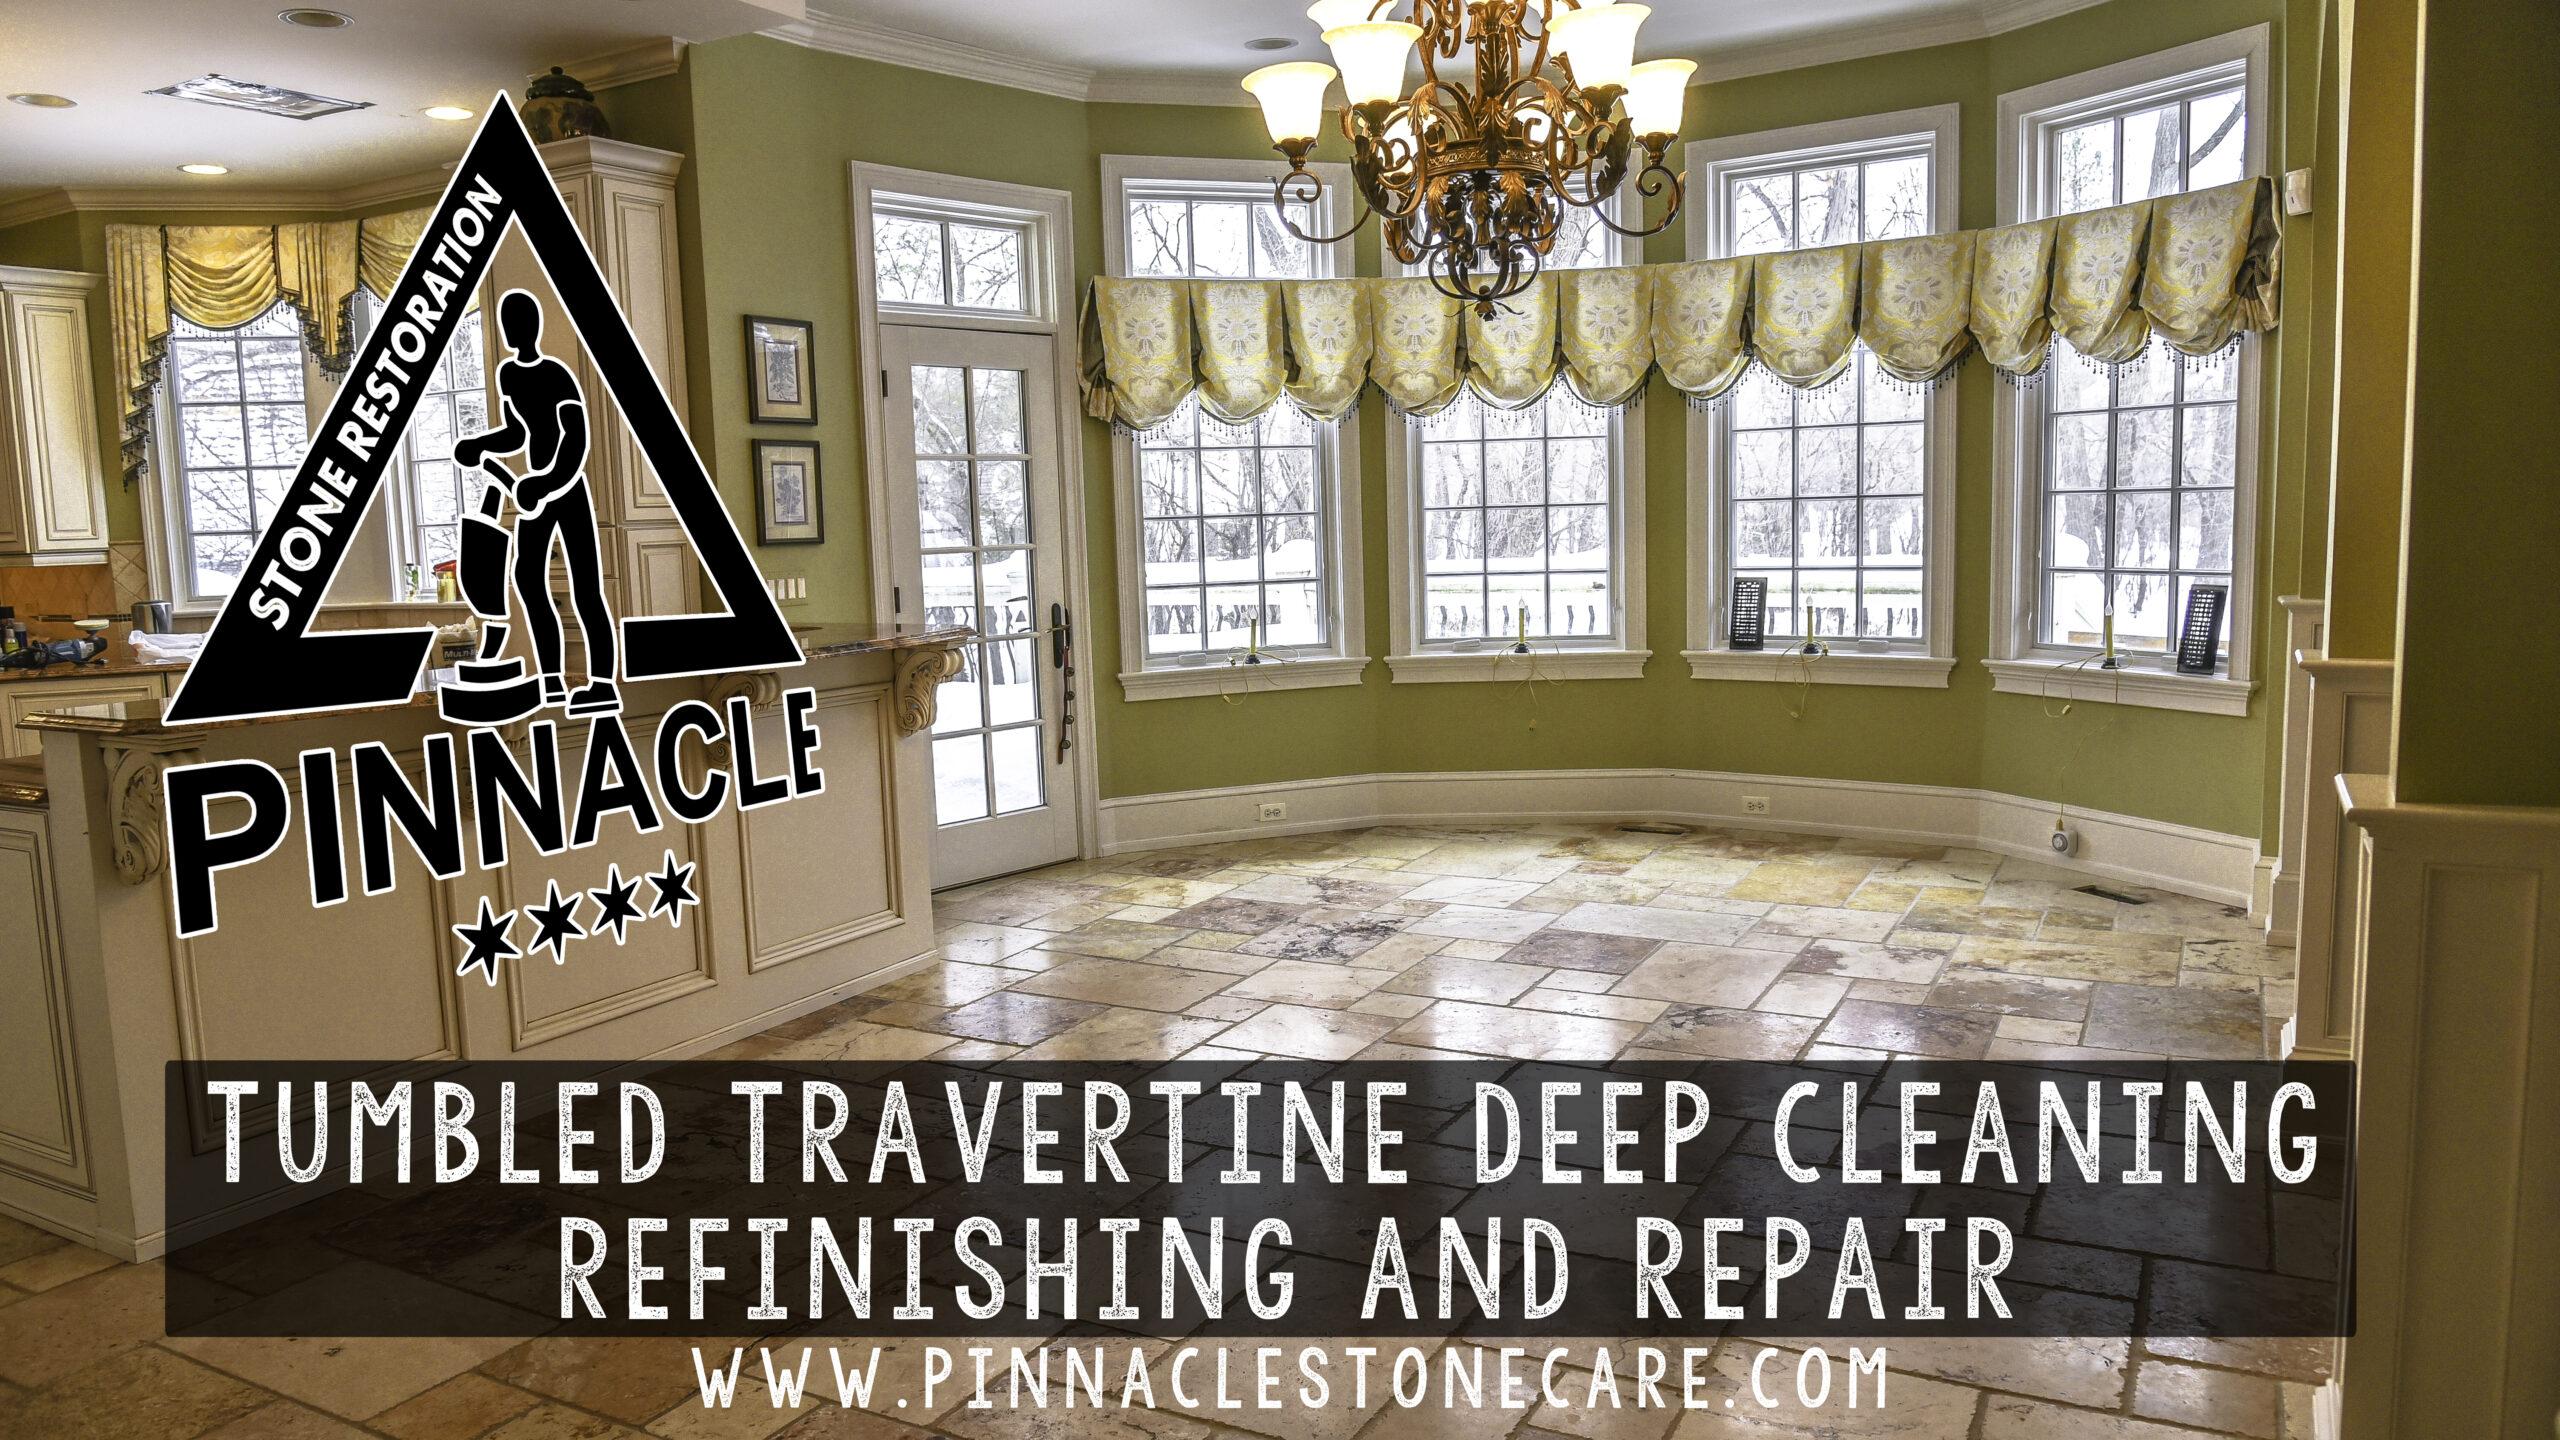 Tumbled Travertine floor deep cleaning, refinishing, and repair Repair